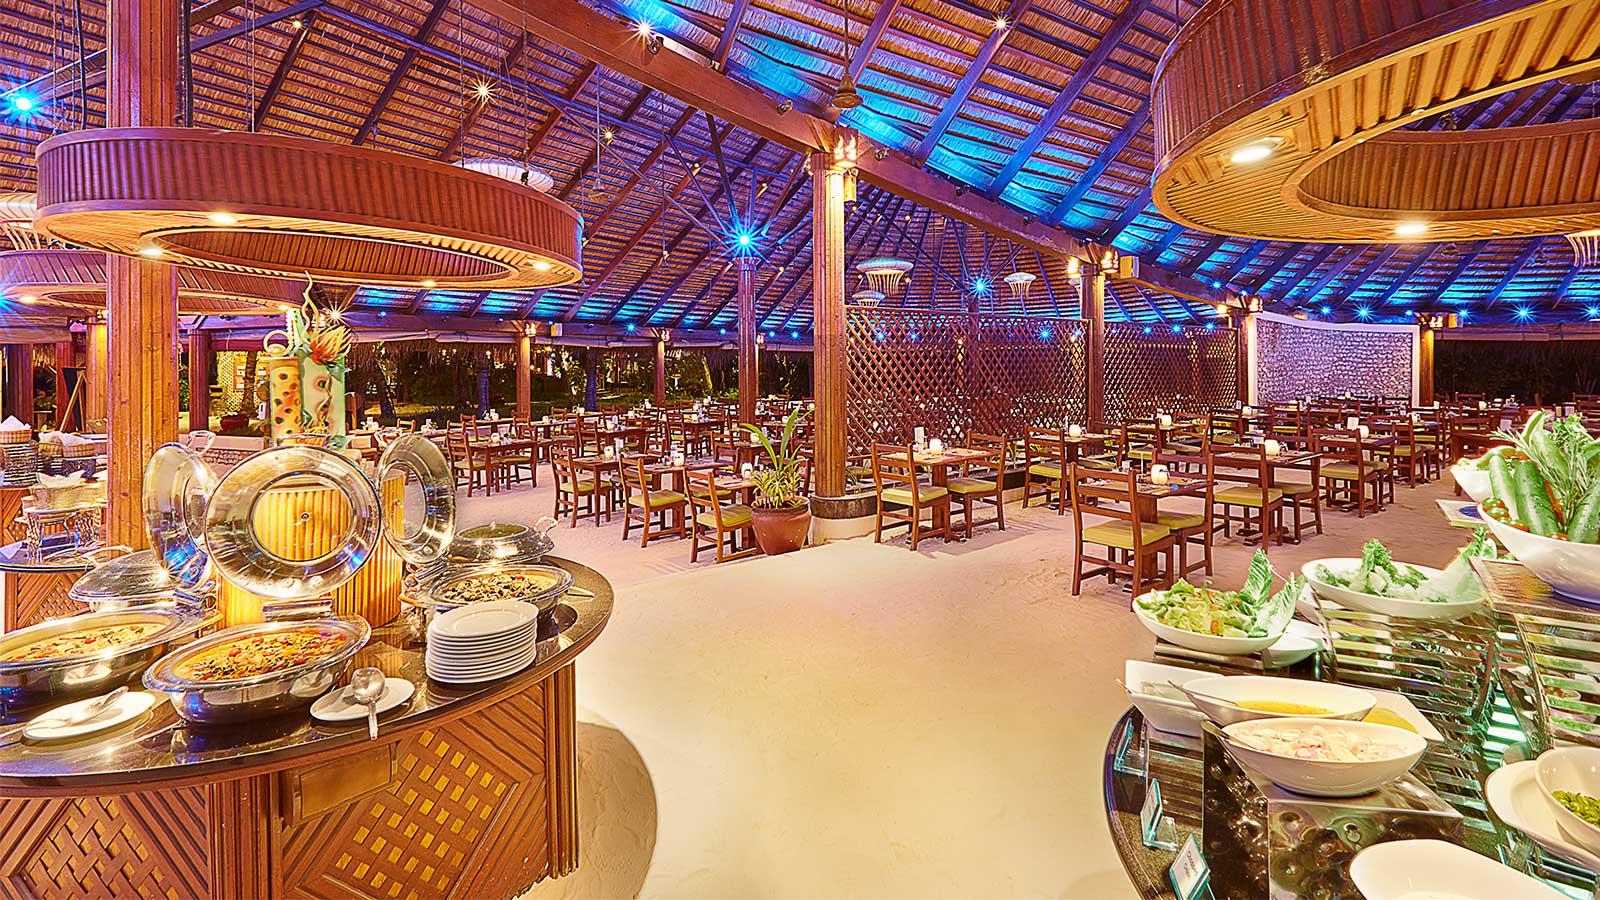 BonthiRestaurant